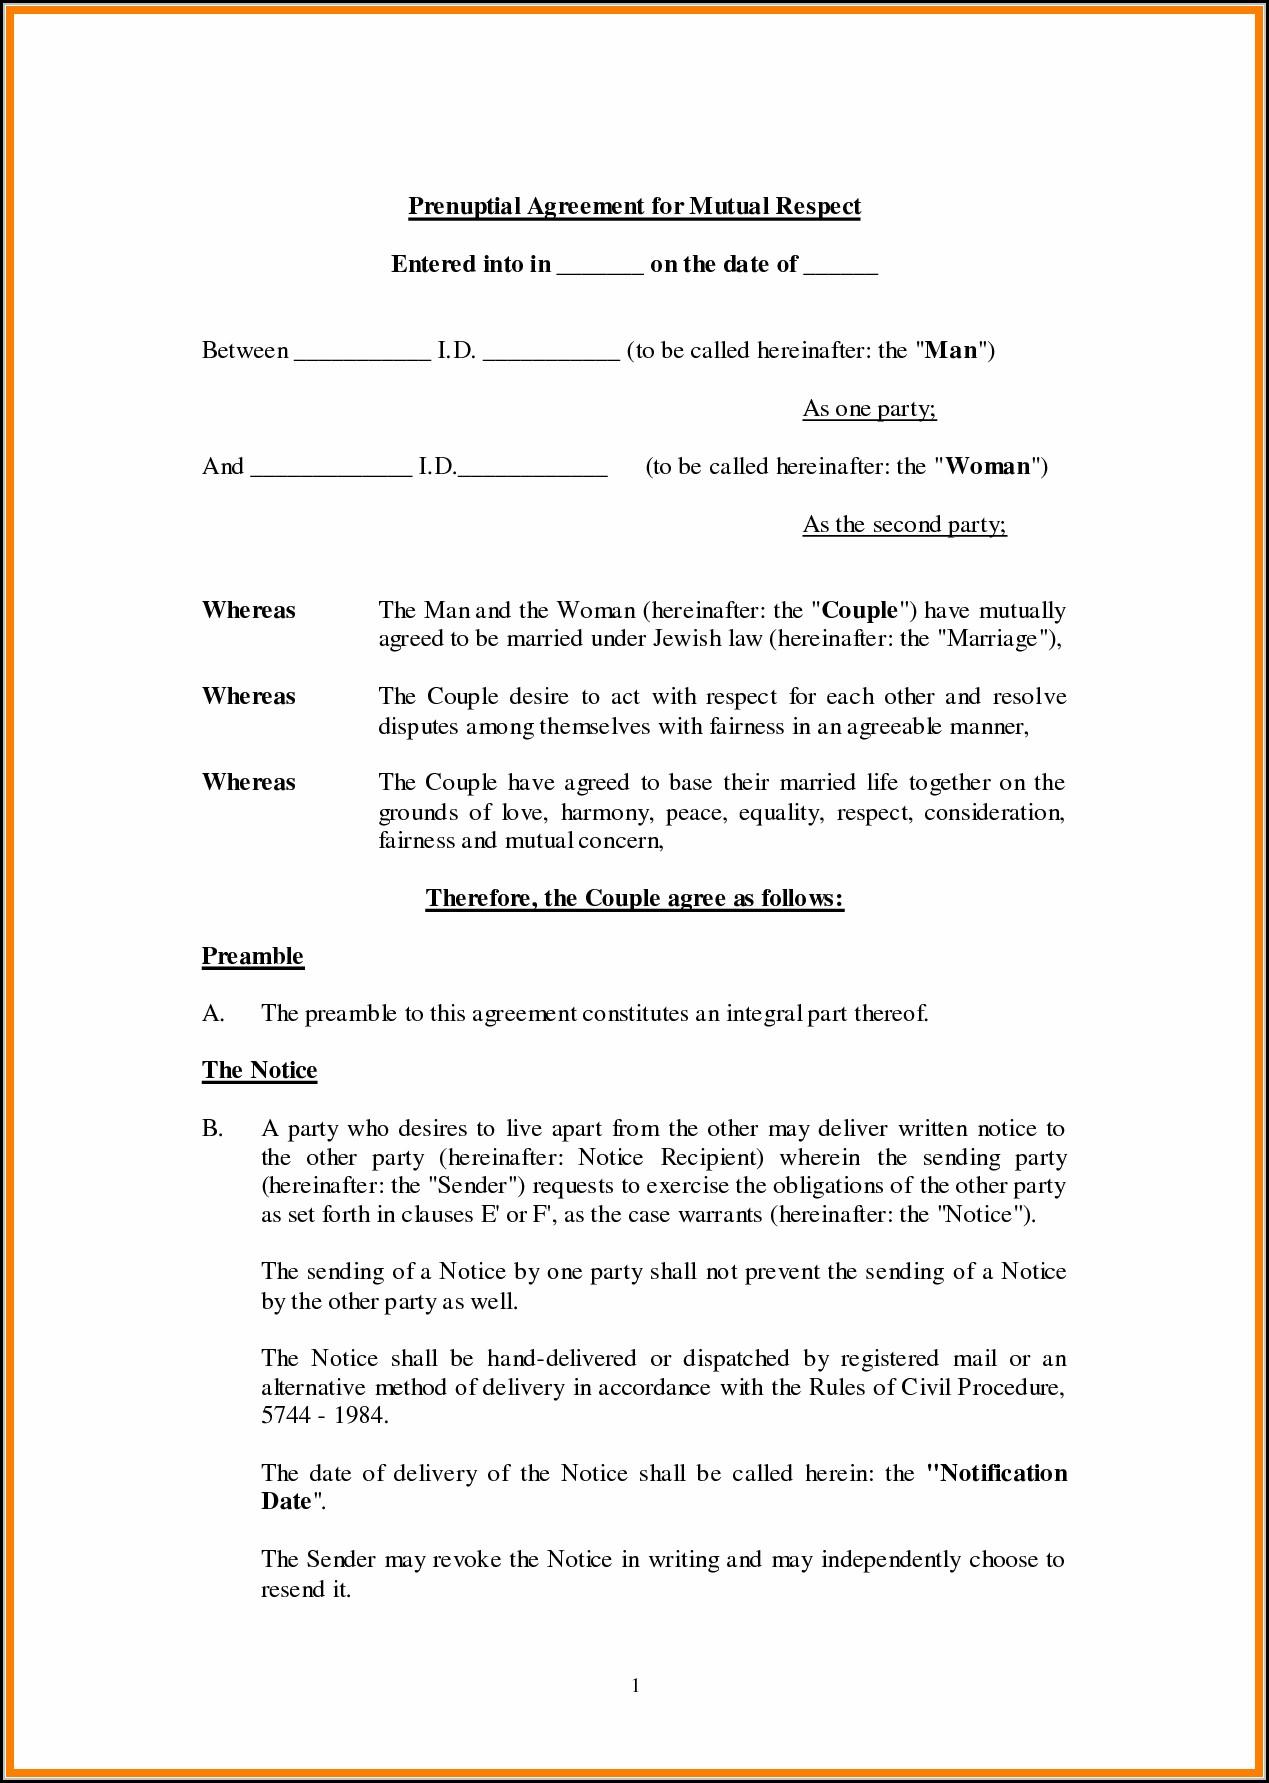 Free Printable Prenuptial Agreement Form - Form : Resume Examples - Free Printable Prenuptial Agreement Form